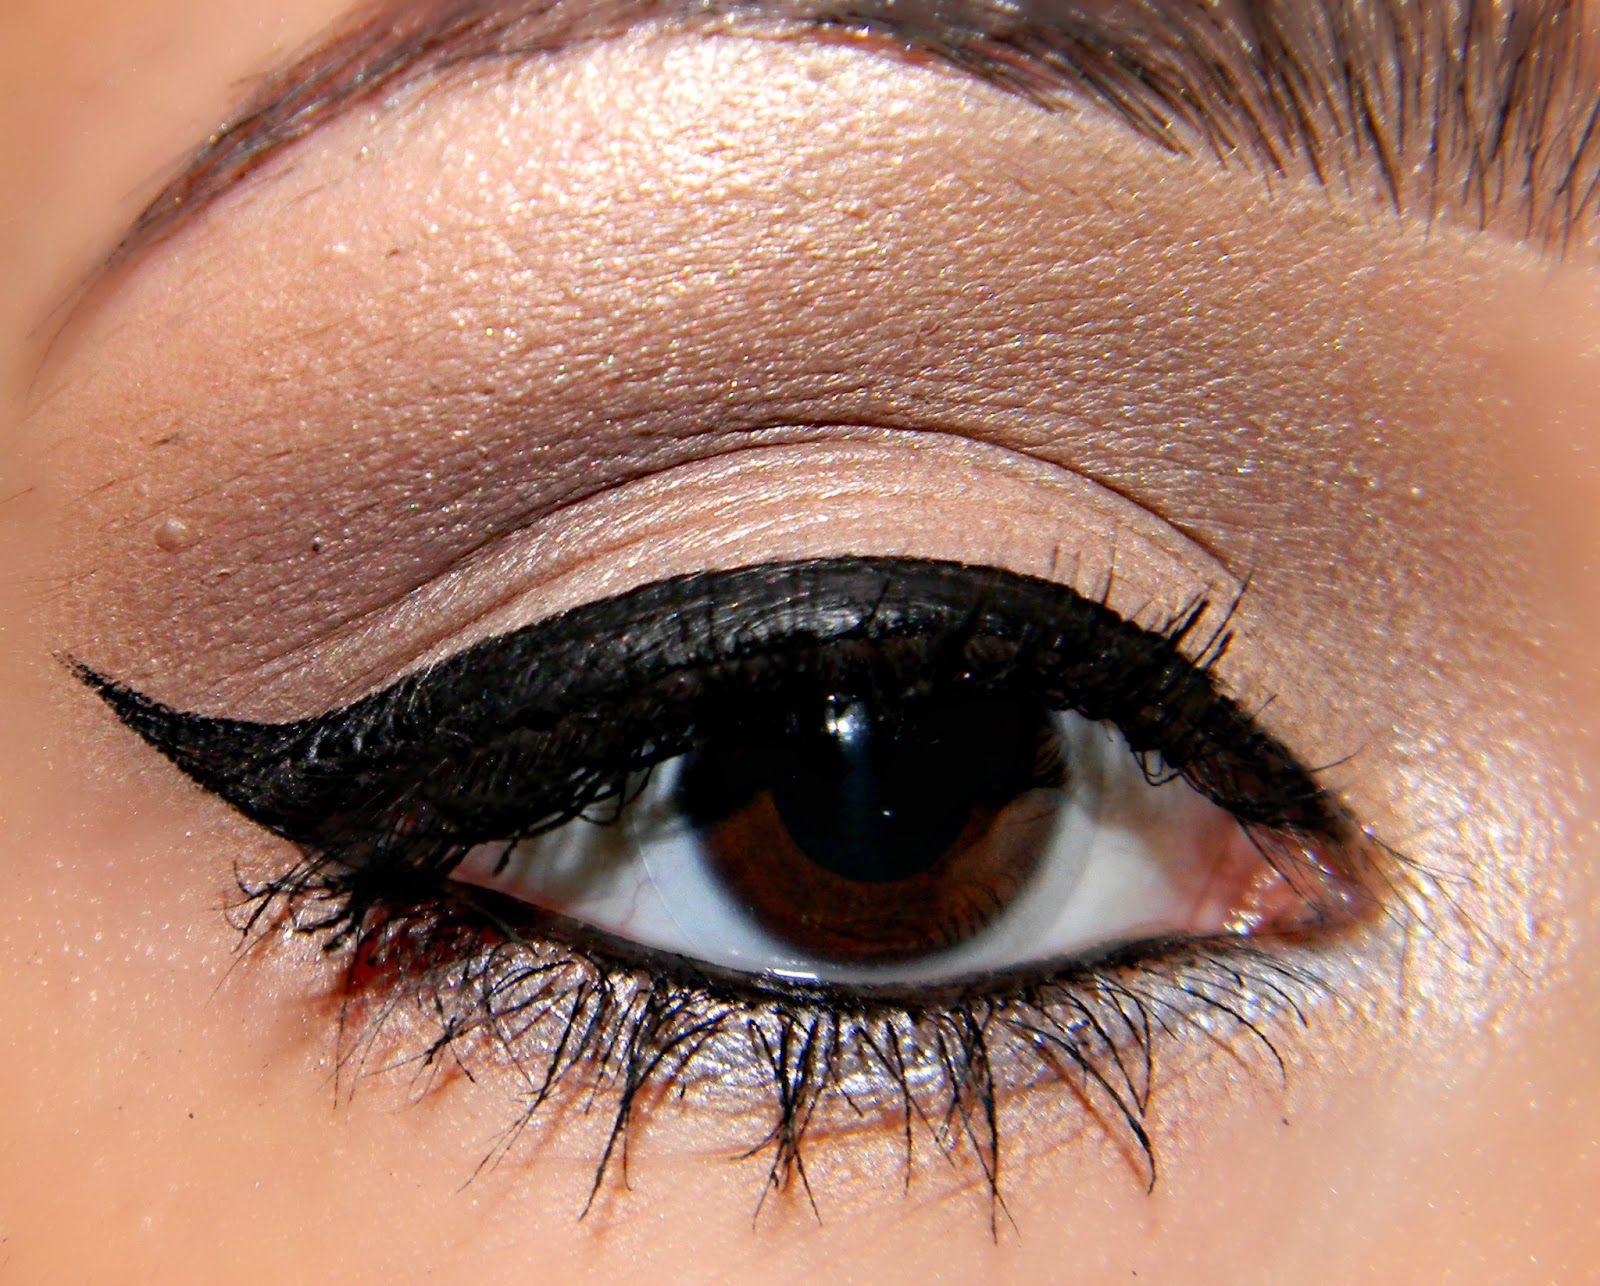 Adele Winged Eyeliner Look Inspirado Na Adele Que Usa Muito